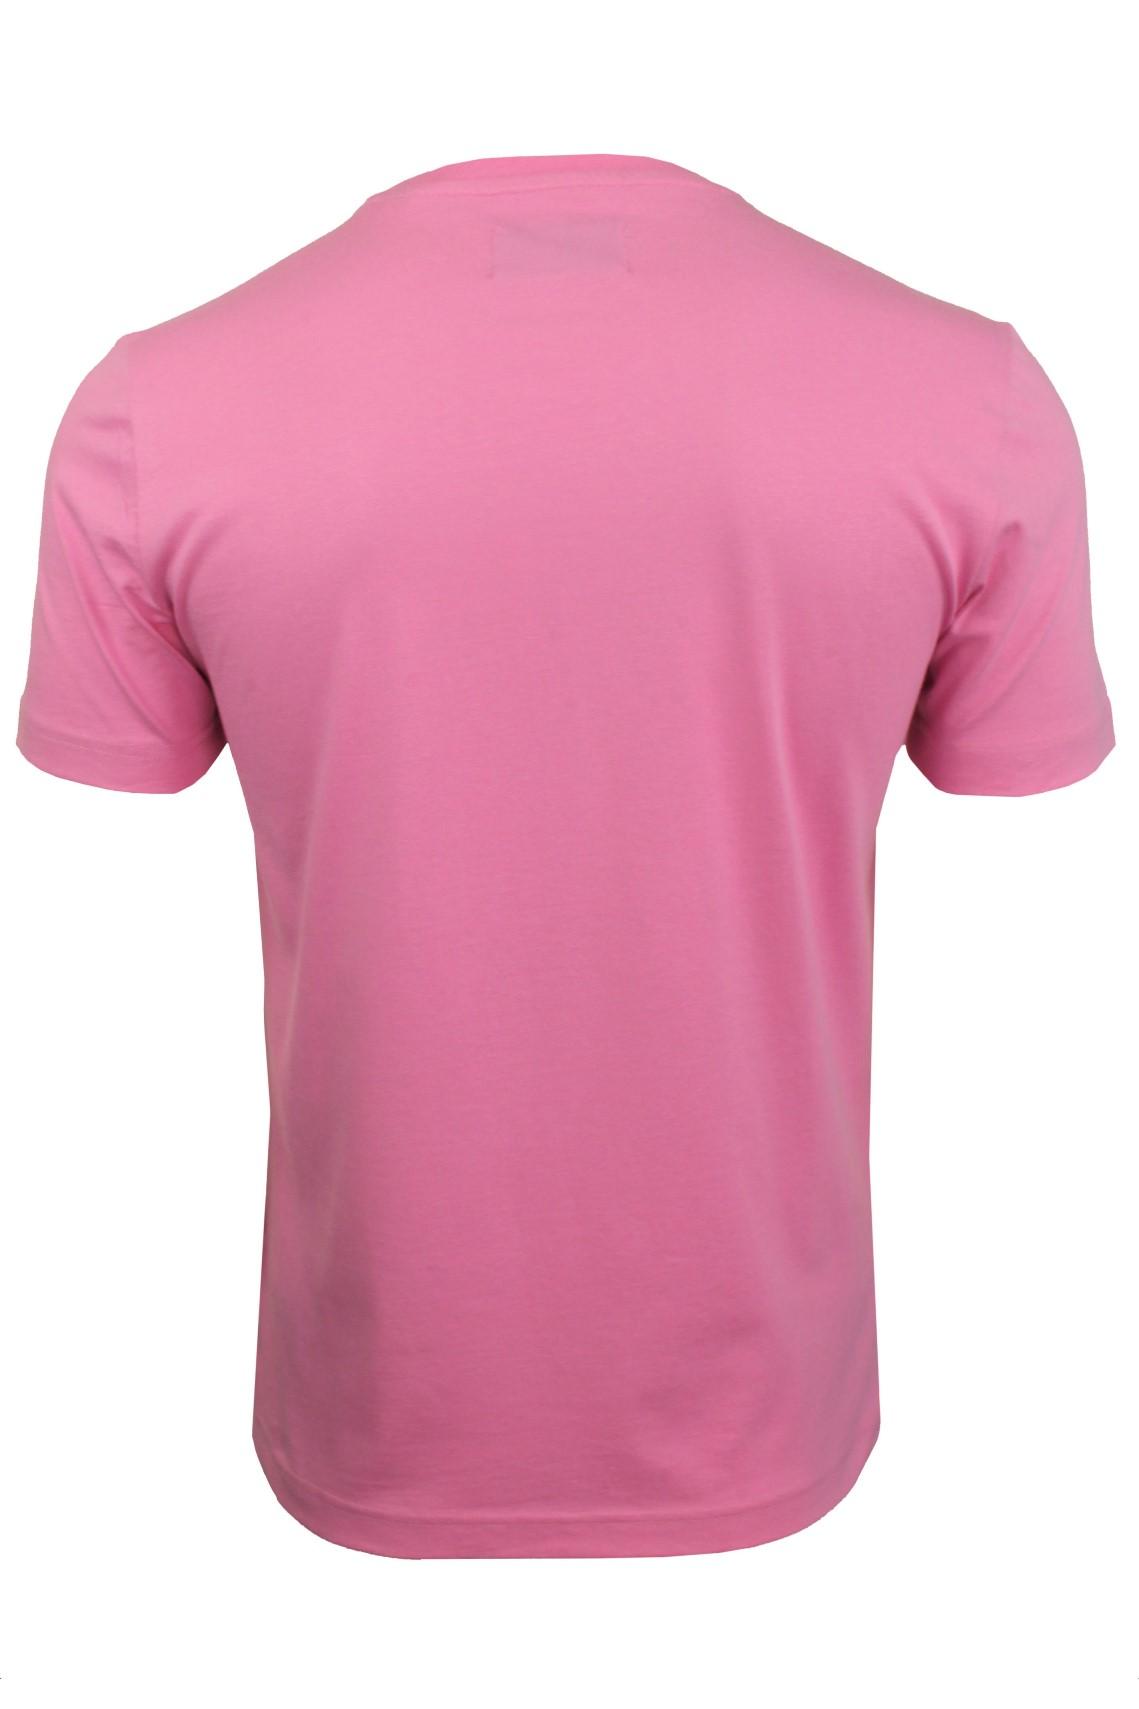 Mens-T-Shirt-by-Original-Penguin-Crew-Neck-Short-Sleeved thumbnail 29